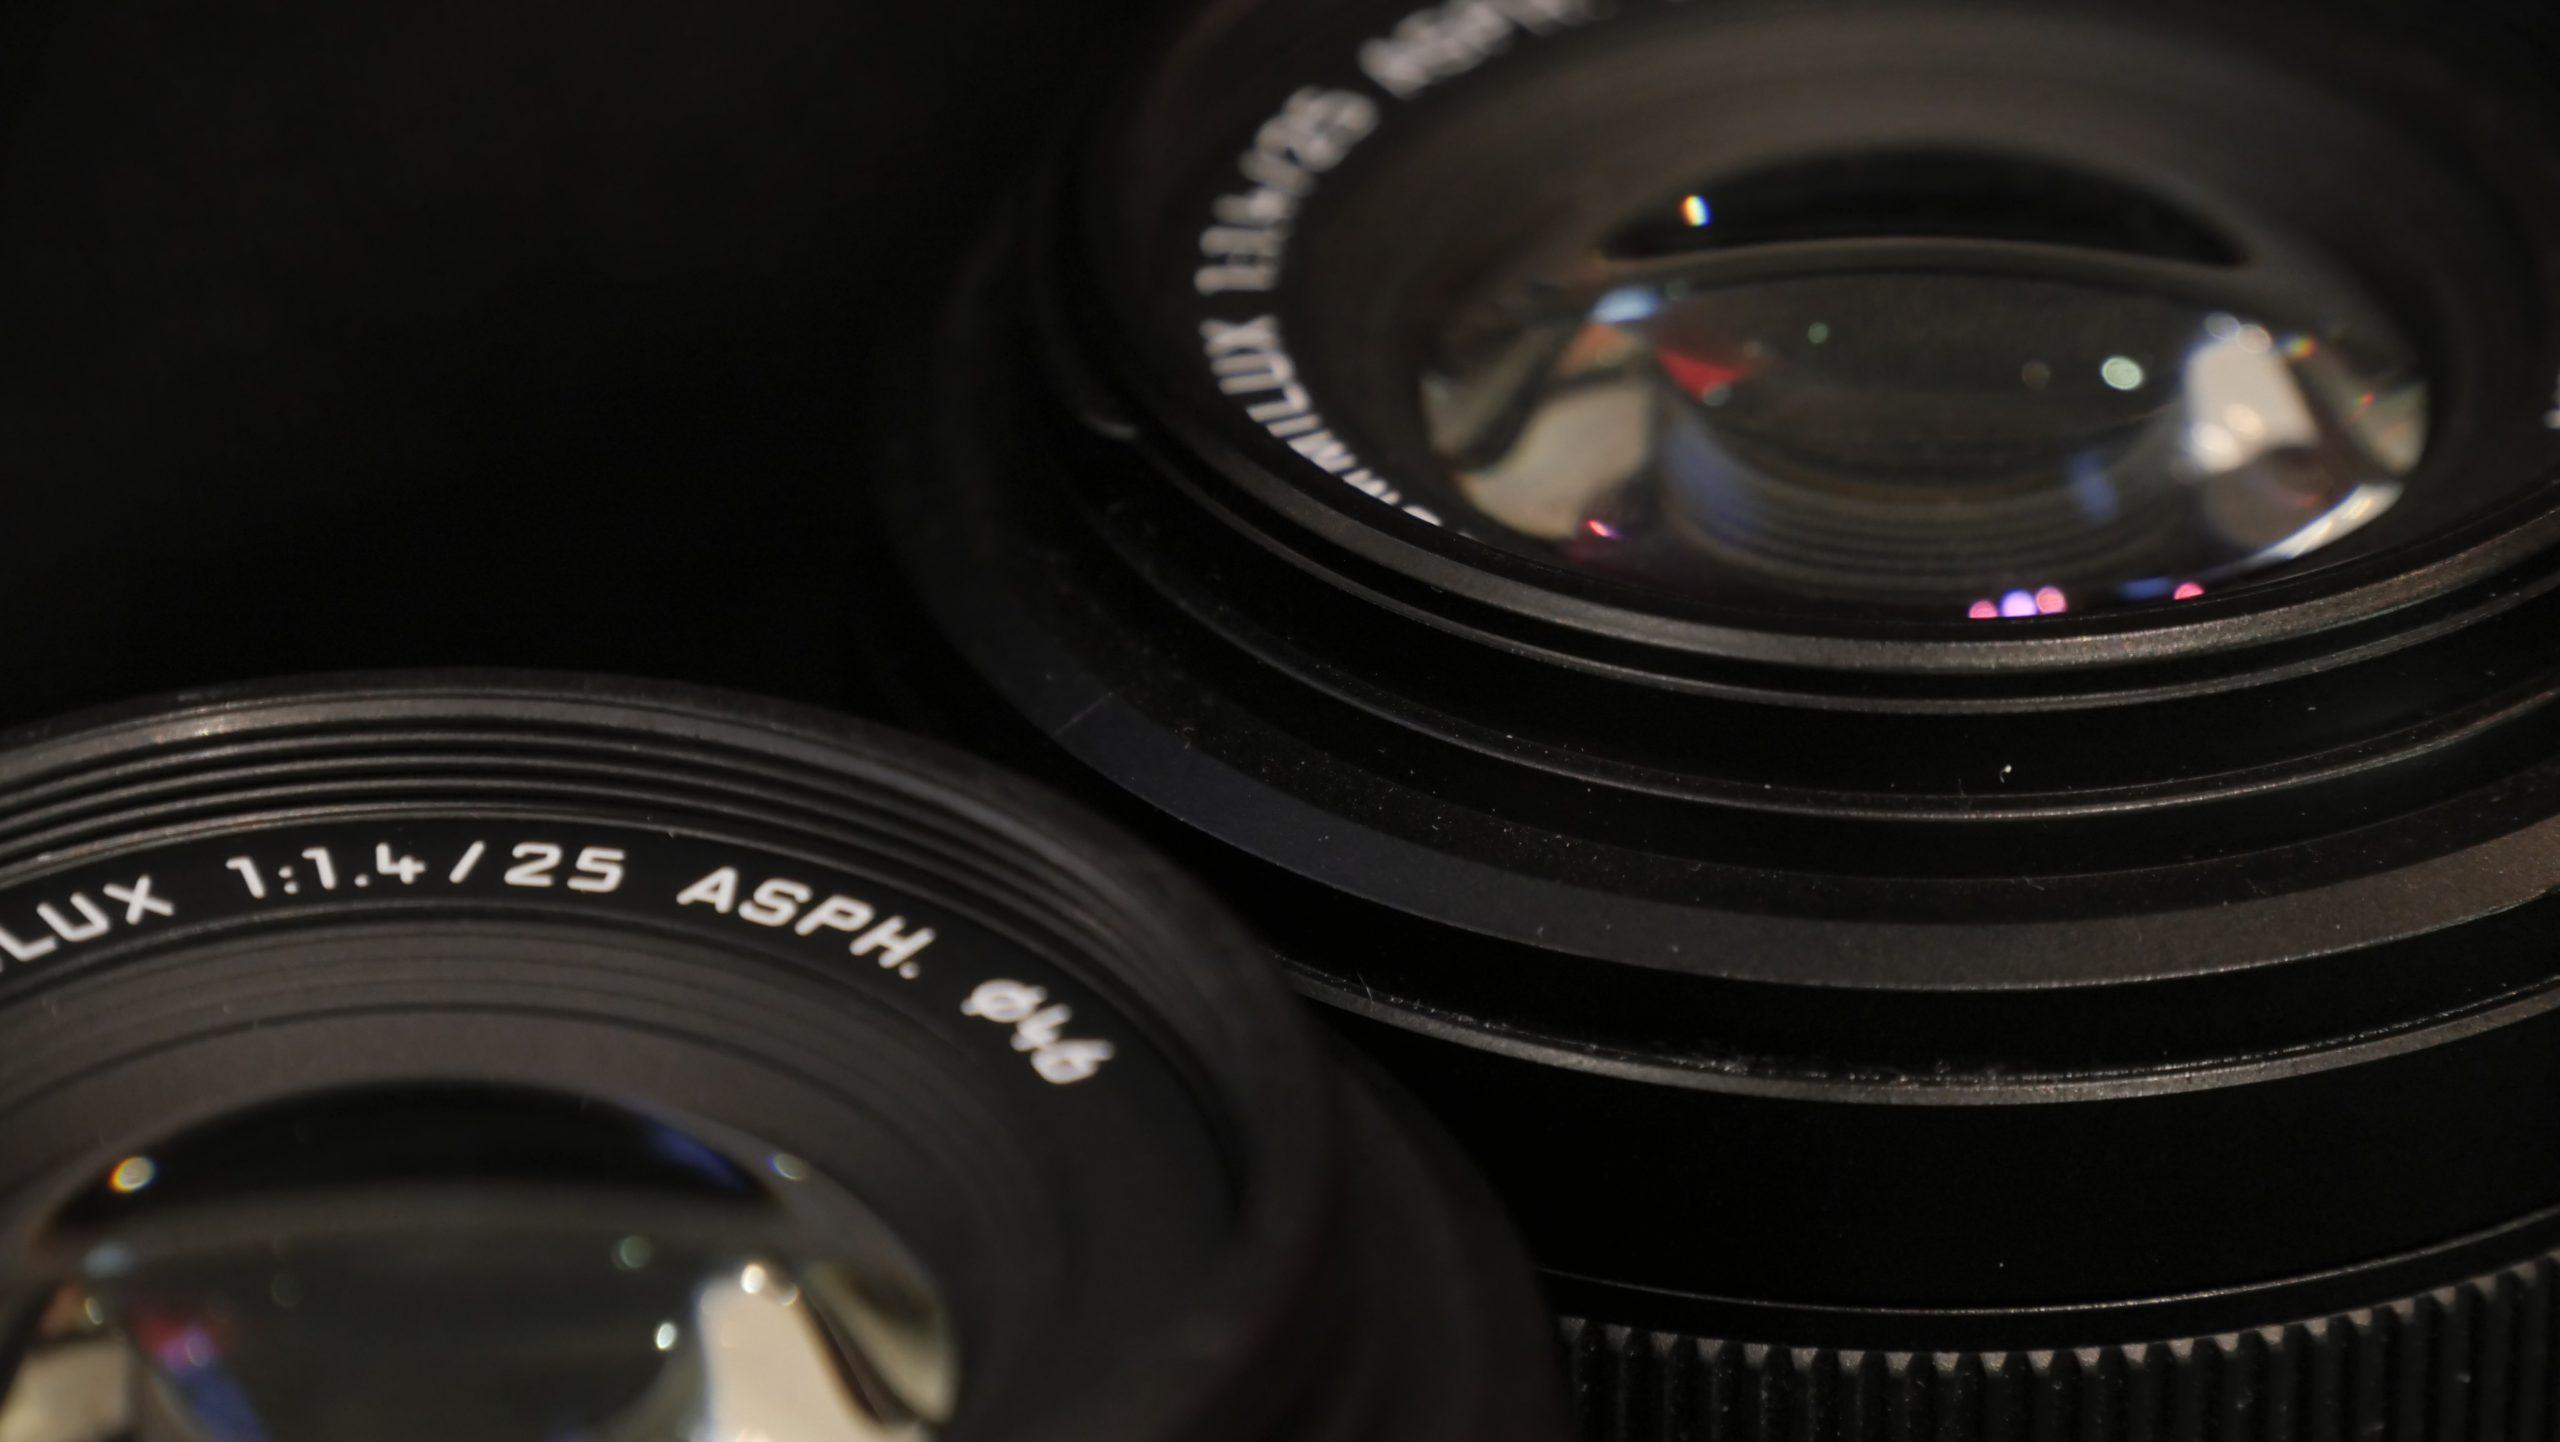 【新旧共存】Panasonic Leica 25mm F1.4